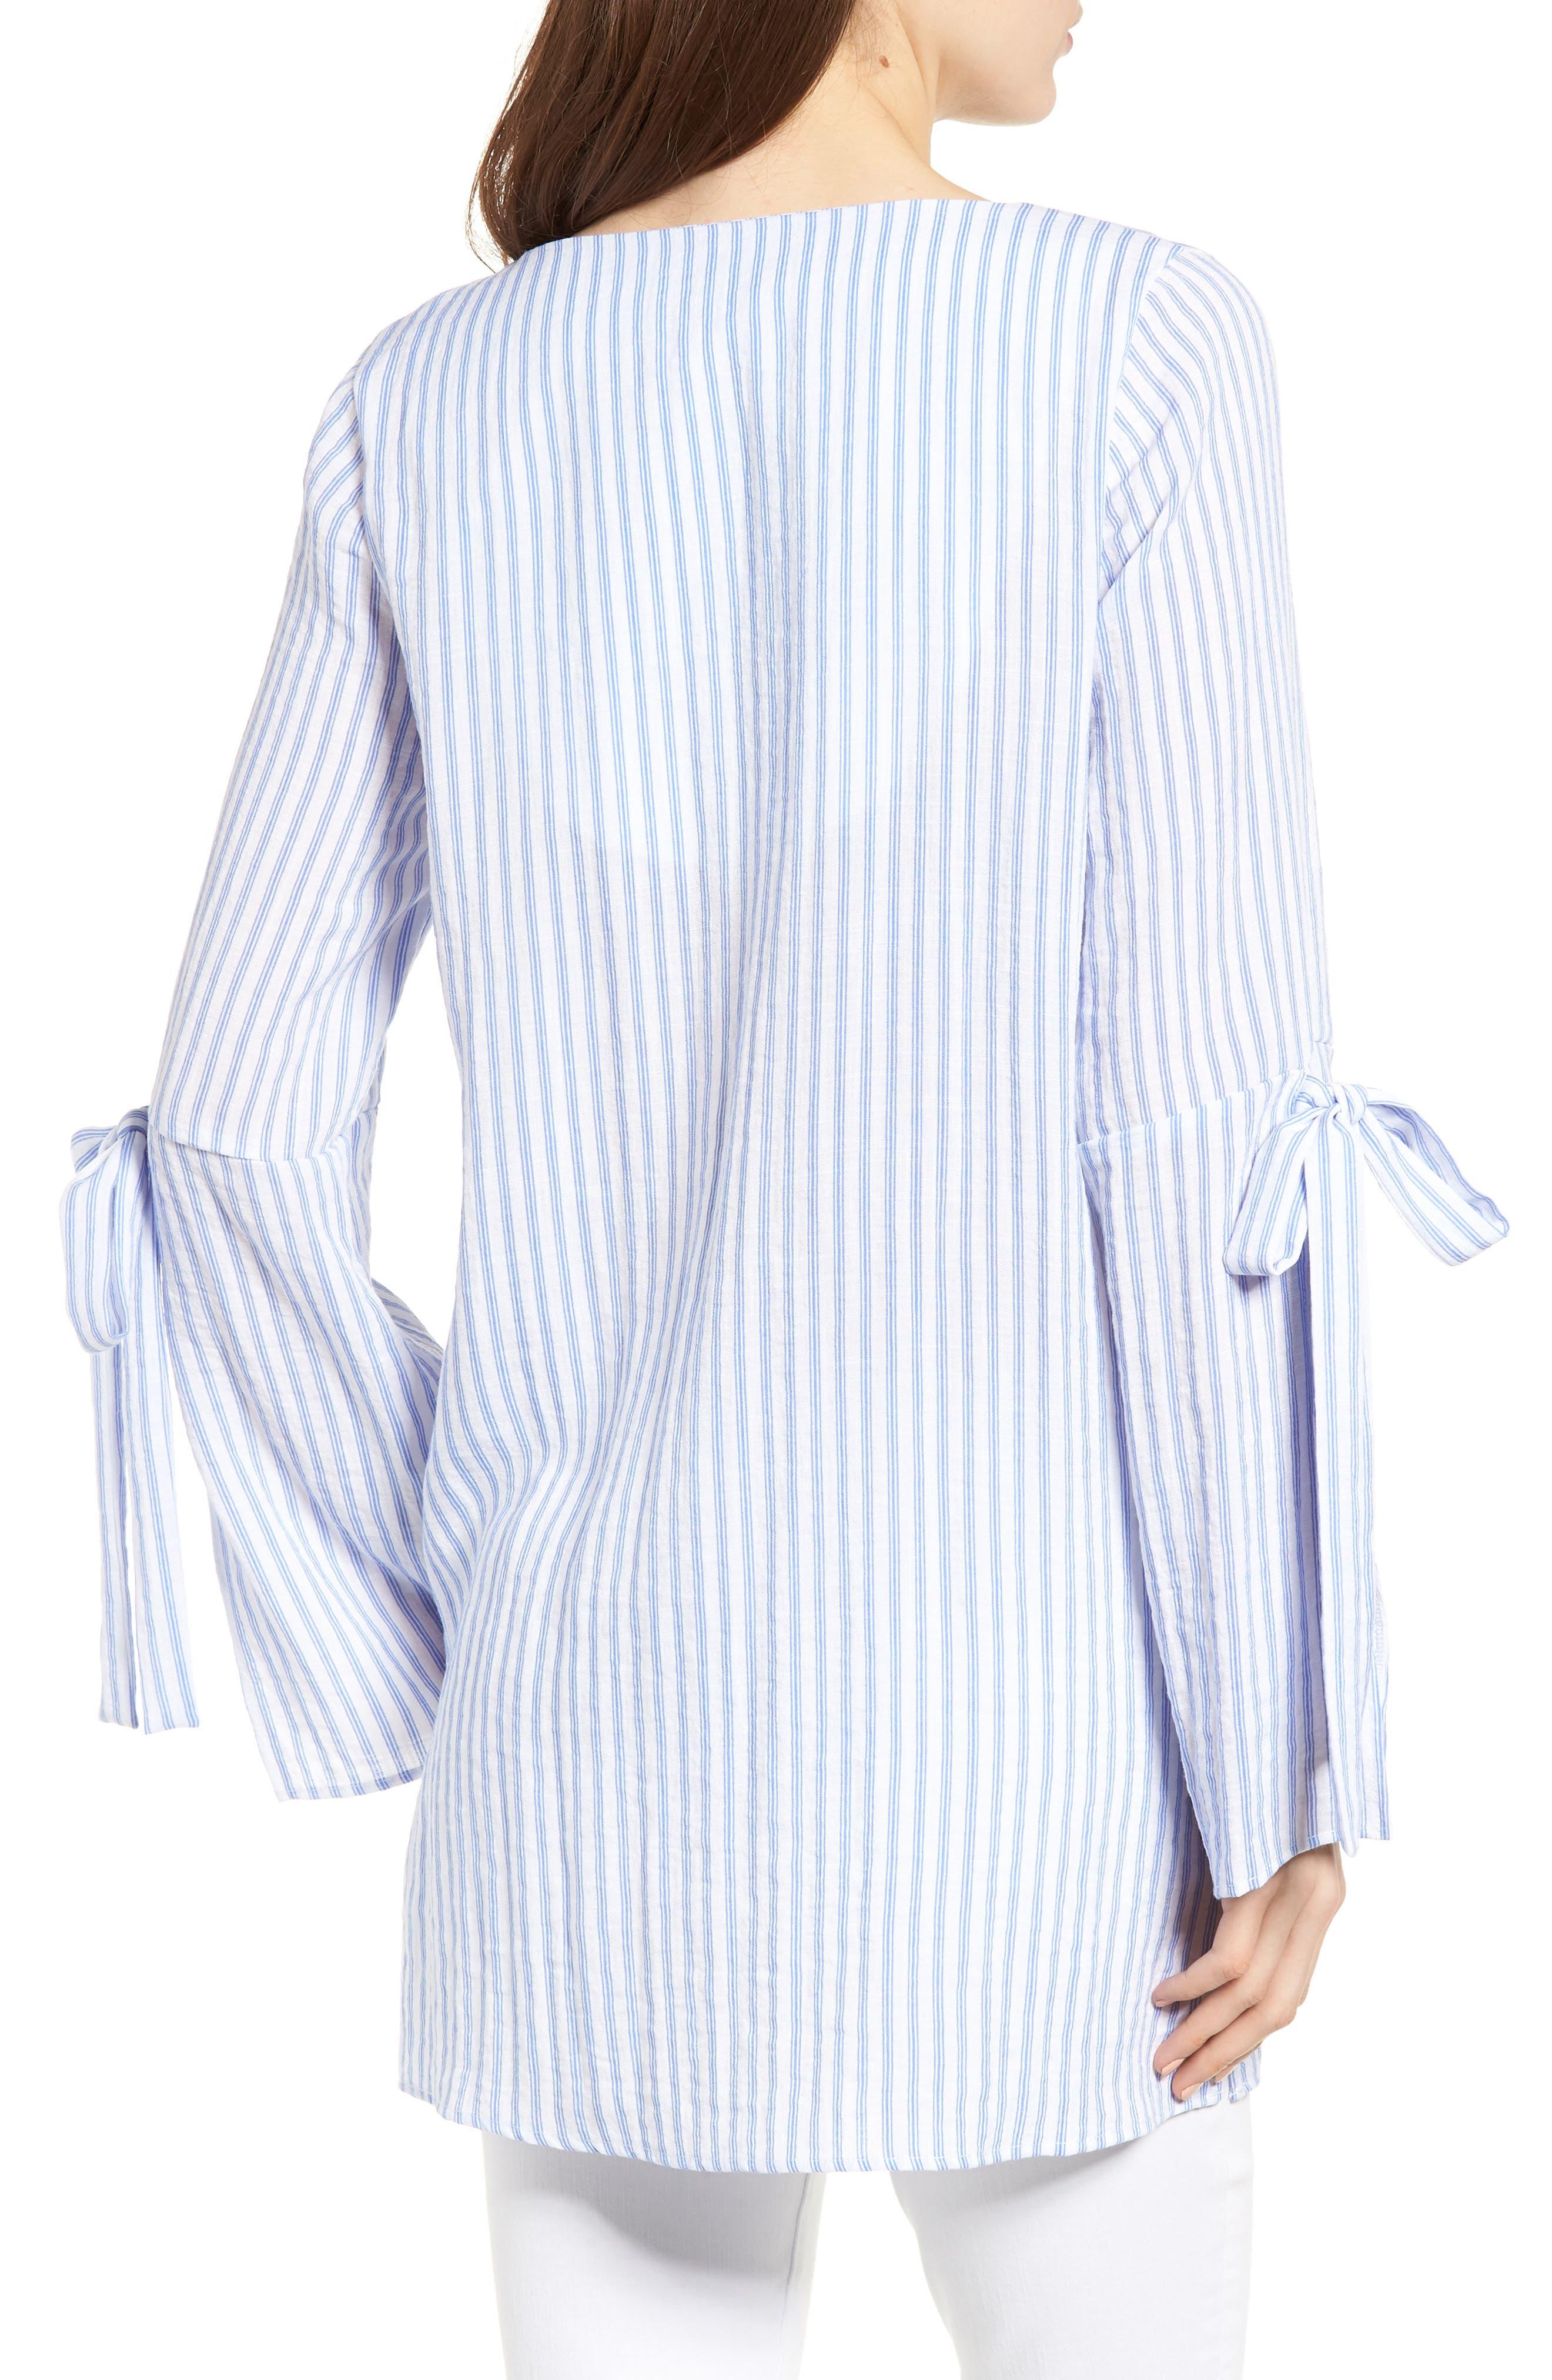 Bishop + Young Stripe Tunic Top,                             Alternate thumbnail 2, color,                             Blue White Stripe